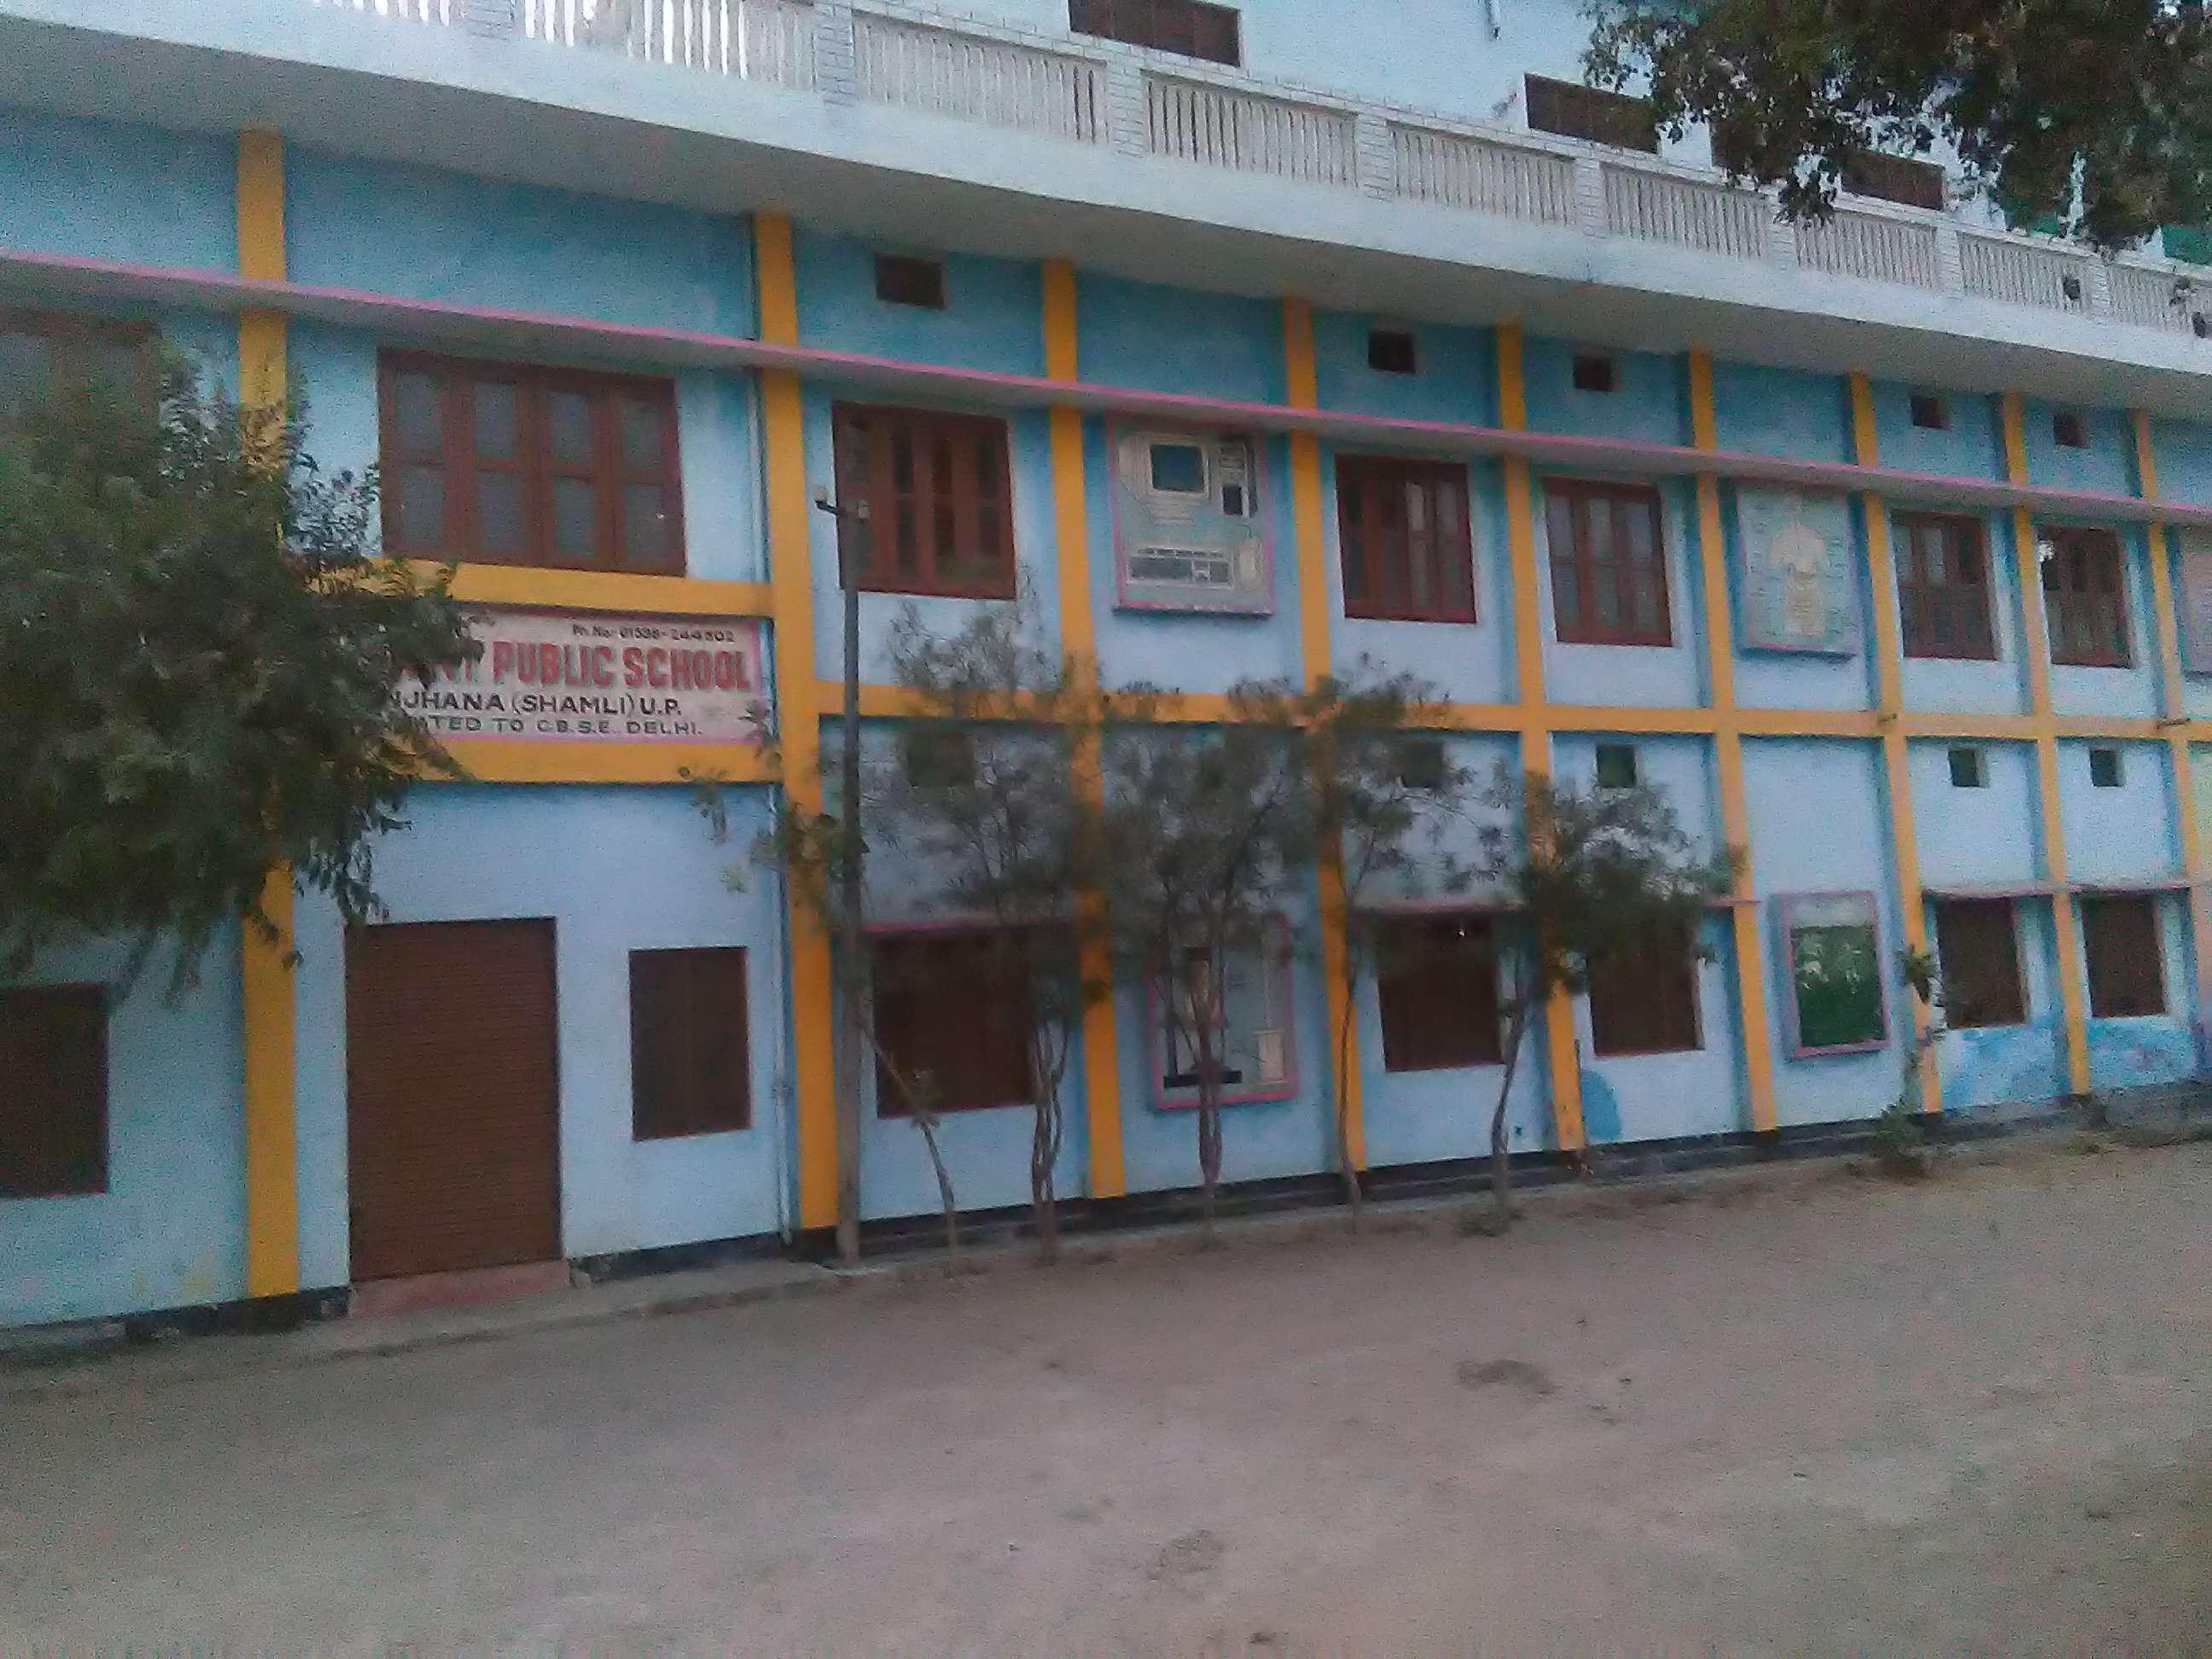 DE SAINT PUBLIC SCHOOL VPO JHINJHANA DISTT MUZAFFARNAGAR UTTAR PRADESH 2130589